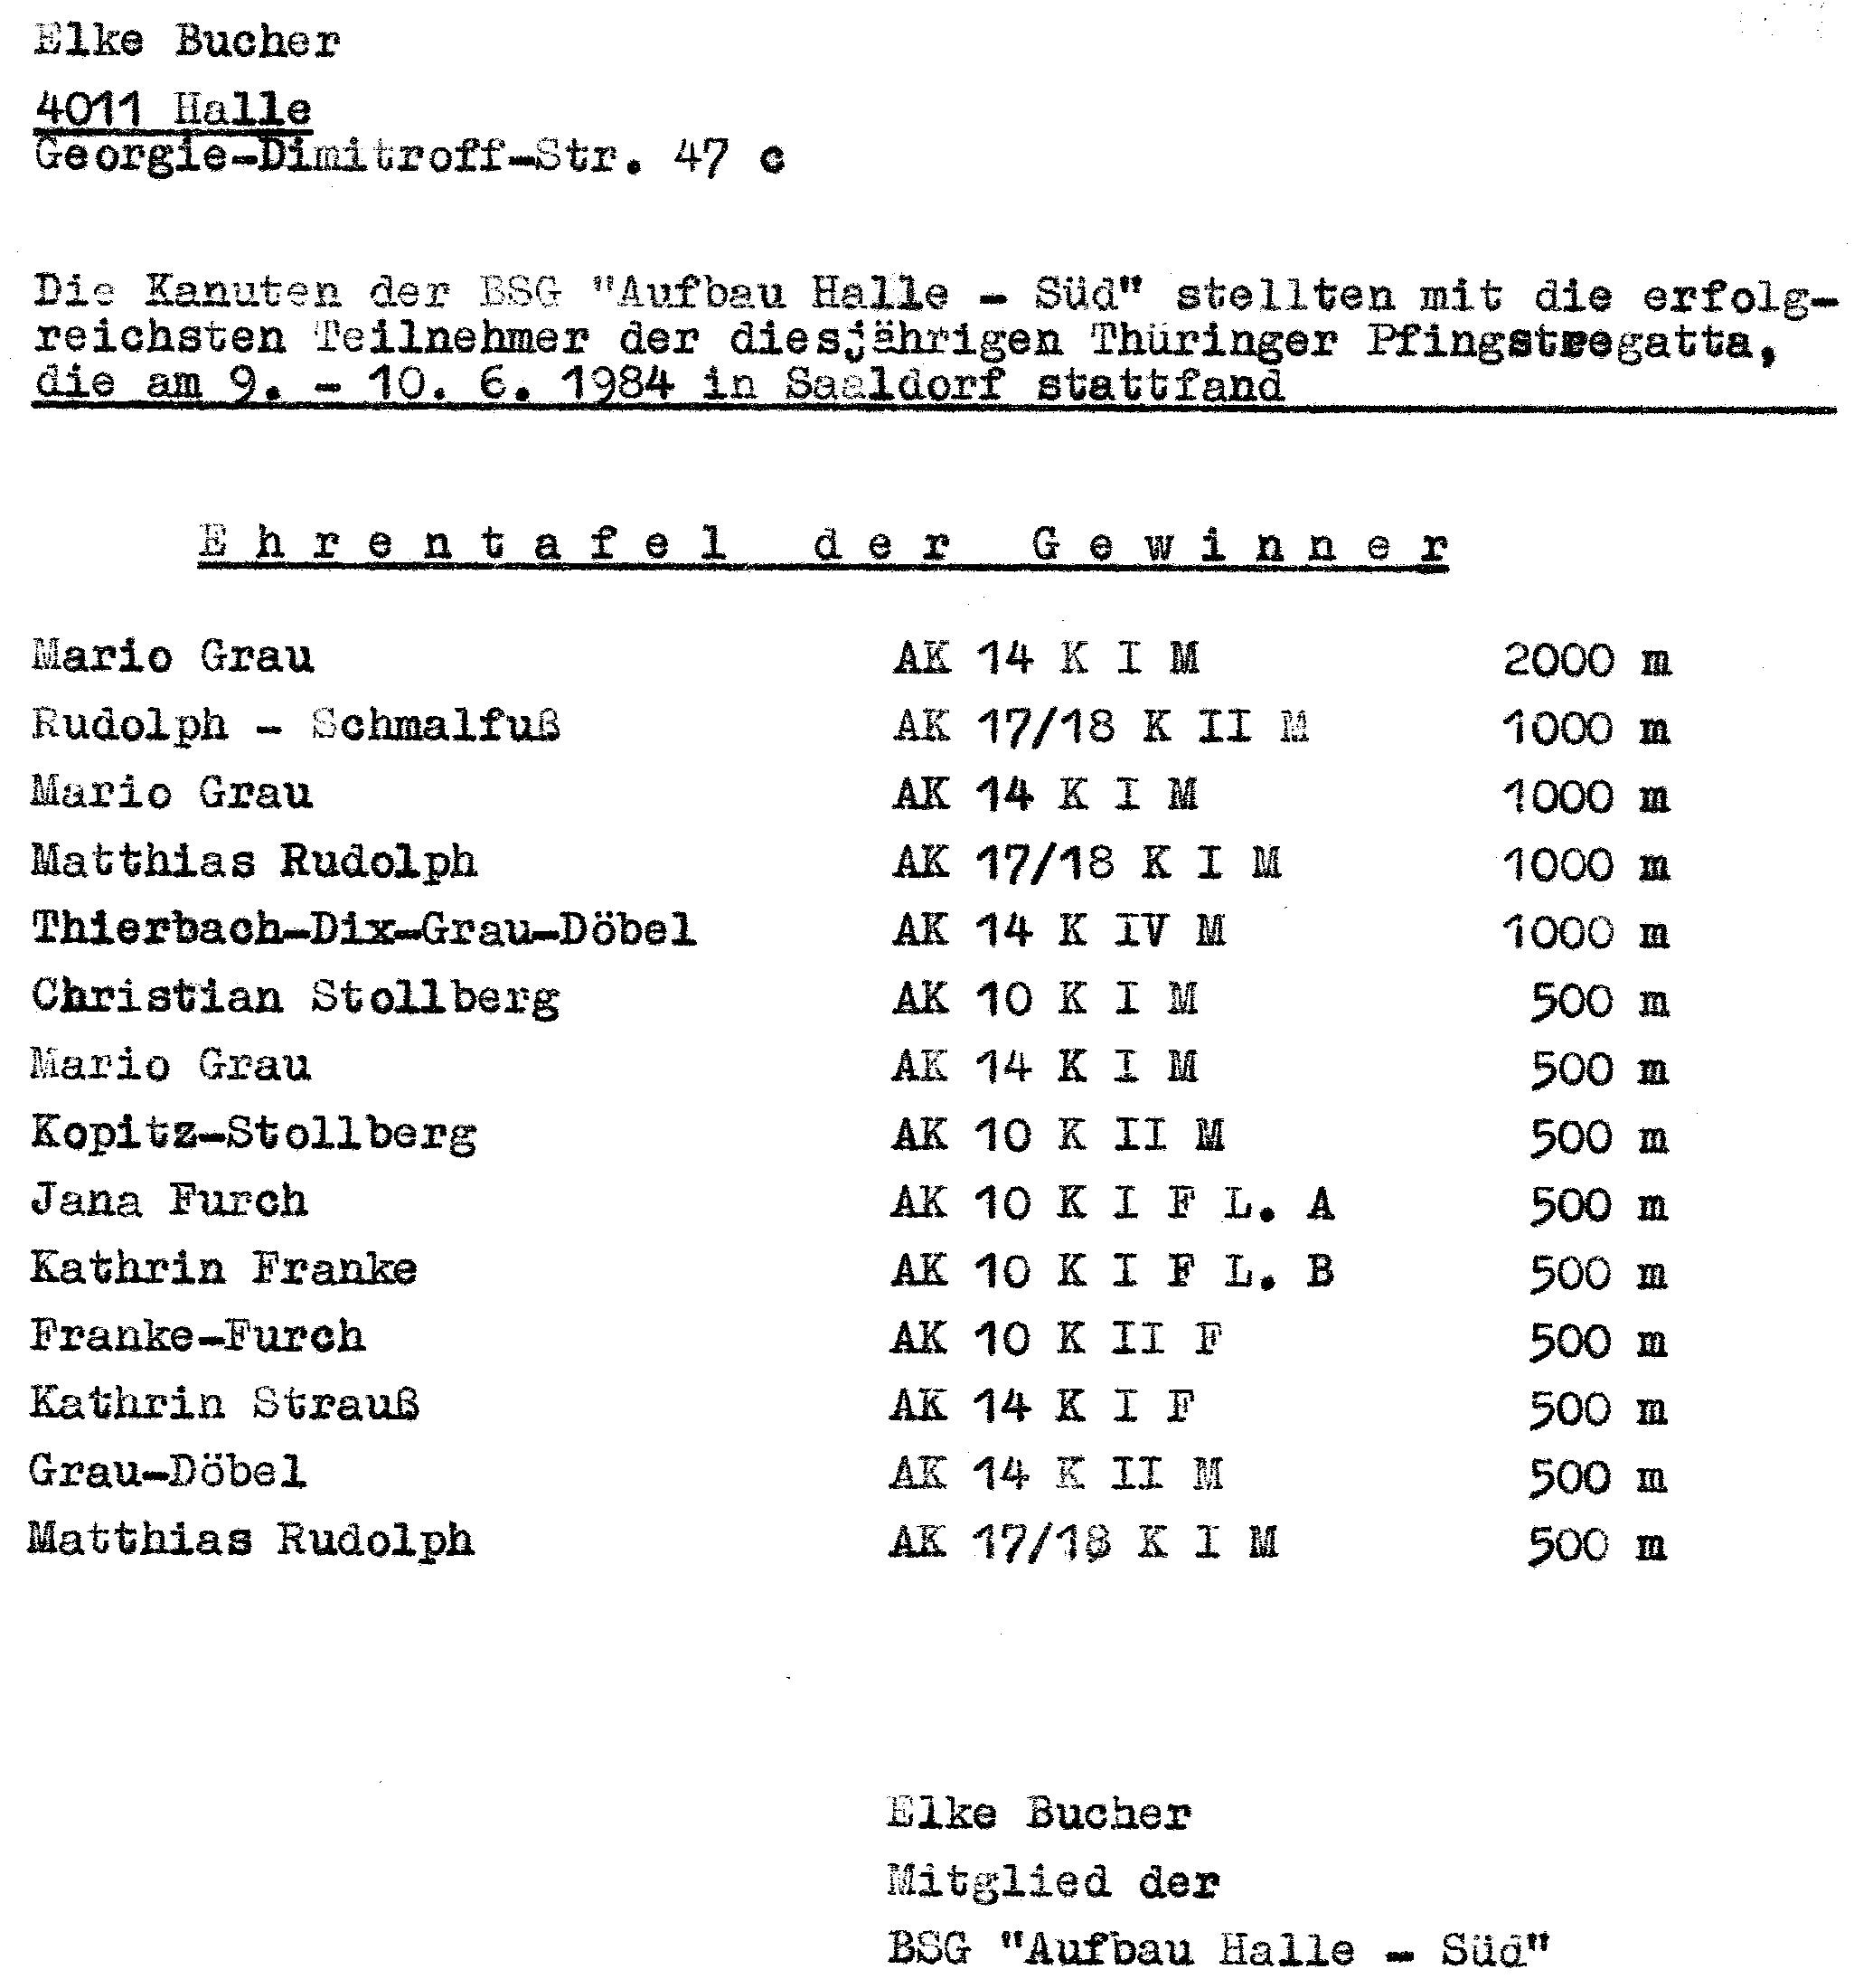 1984-06 Ehrentafel Pfingstregatta Saaldorf